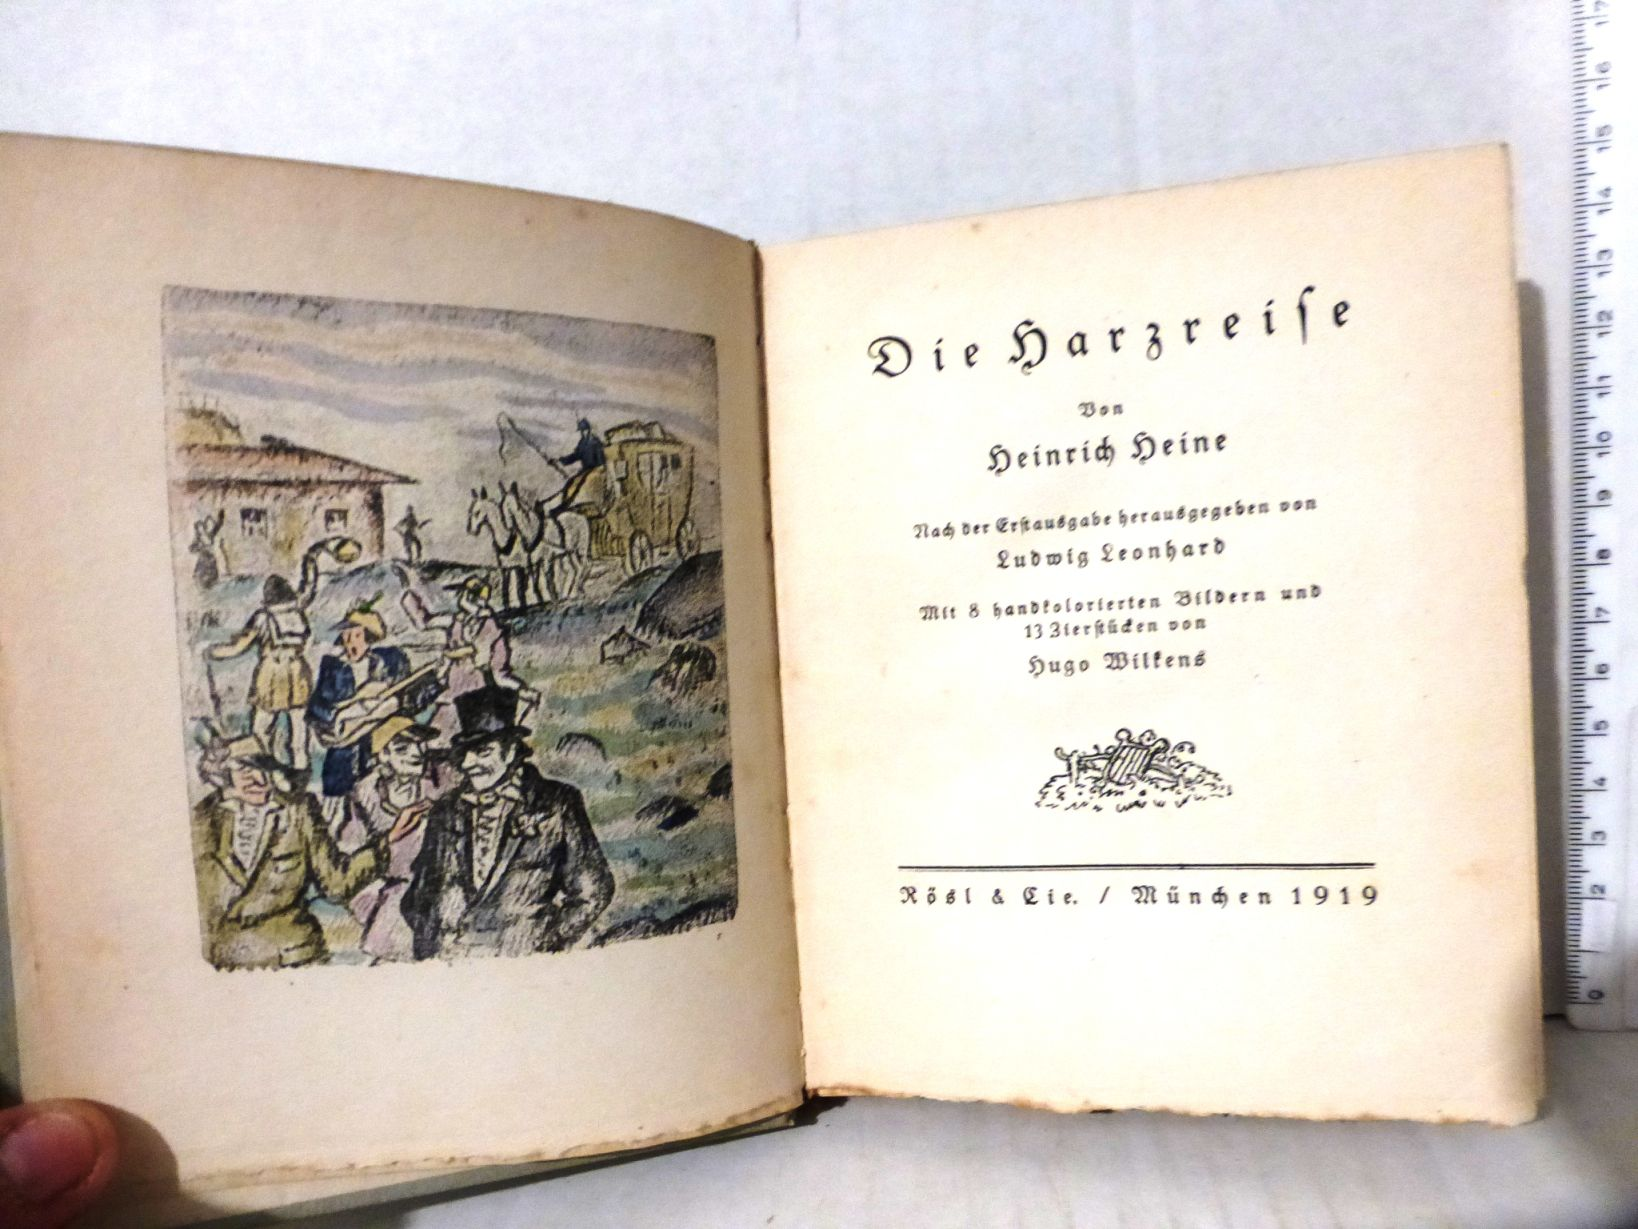 המסע להרץ, עם 8 לוחות צבועים ביד Die Harzreise, mit 8 Handkolorierten Bildern und 13 Zierstuecken von Hugo Wilkens, Muenchen 1915